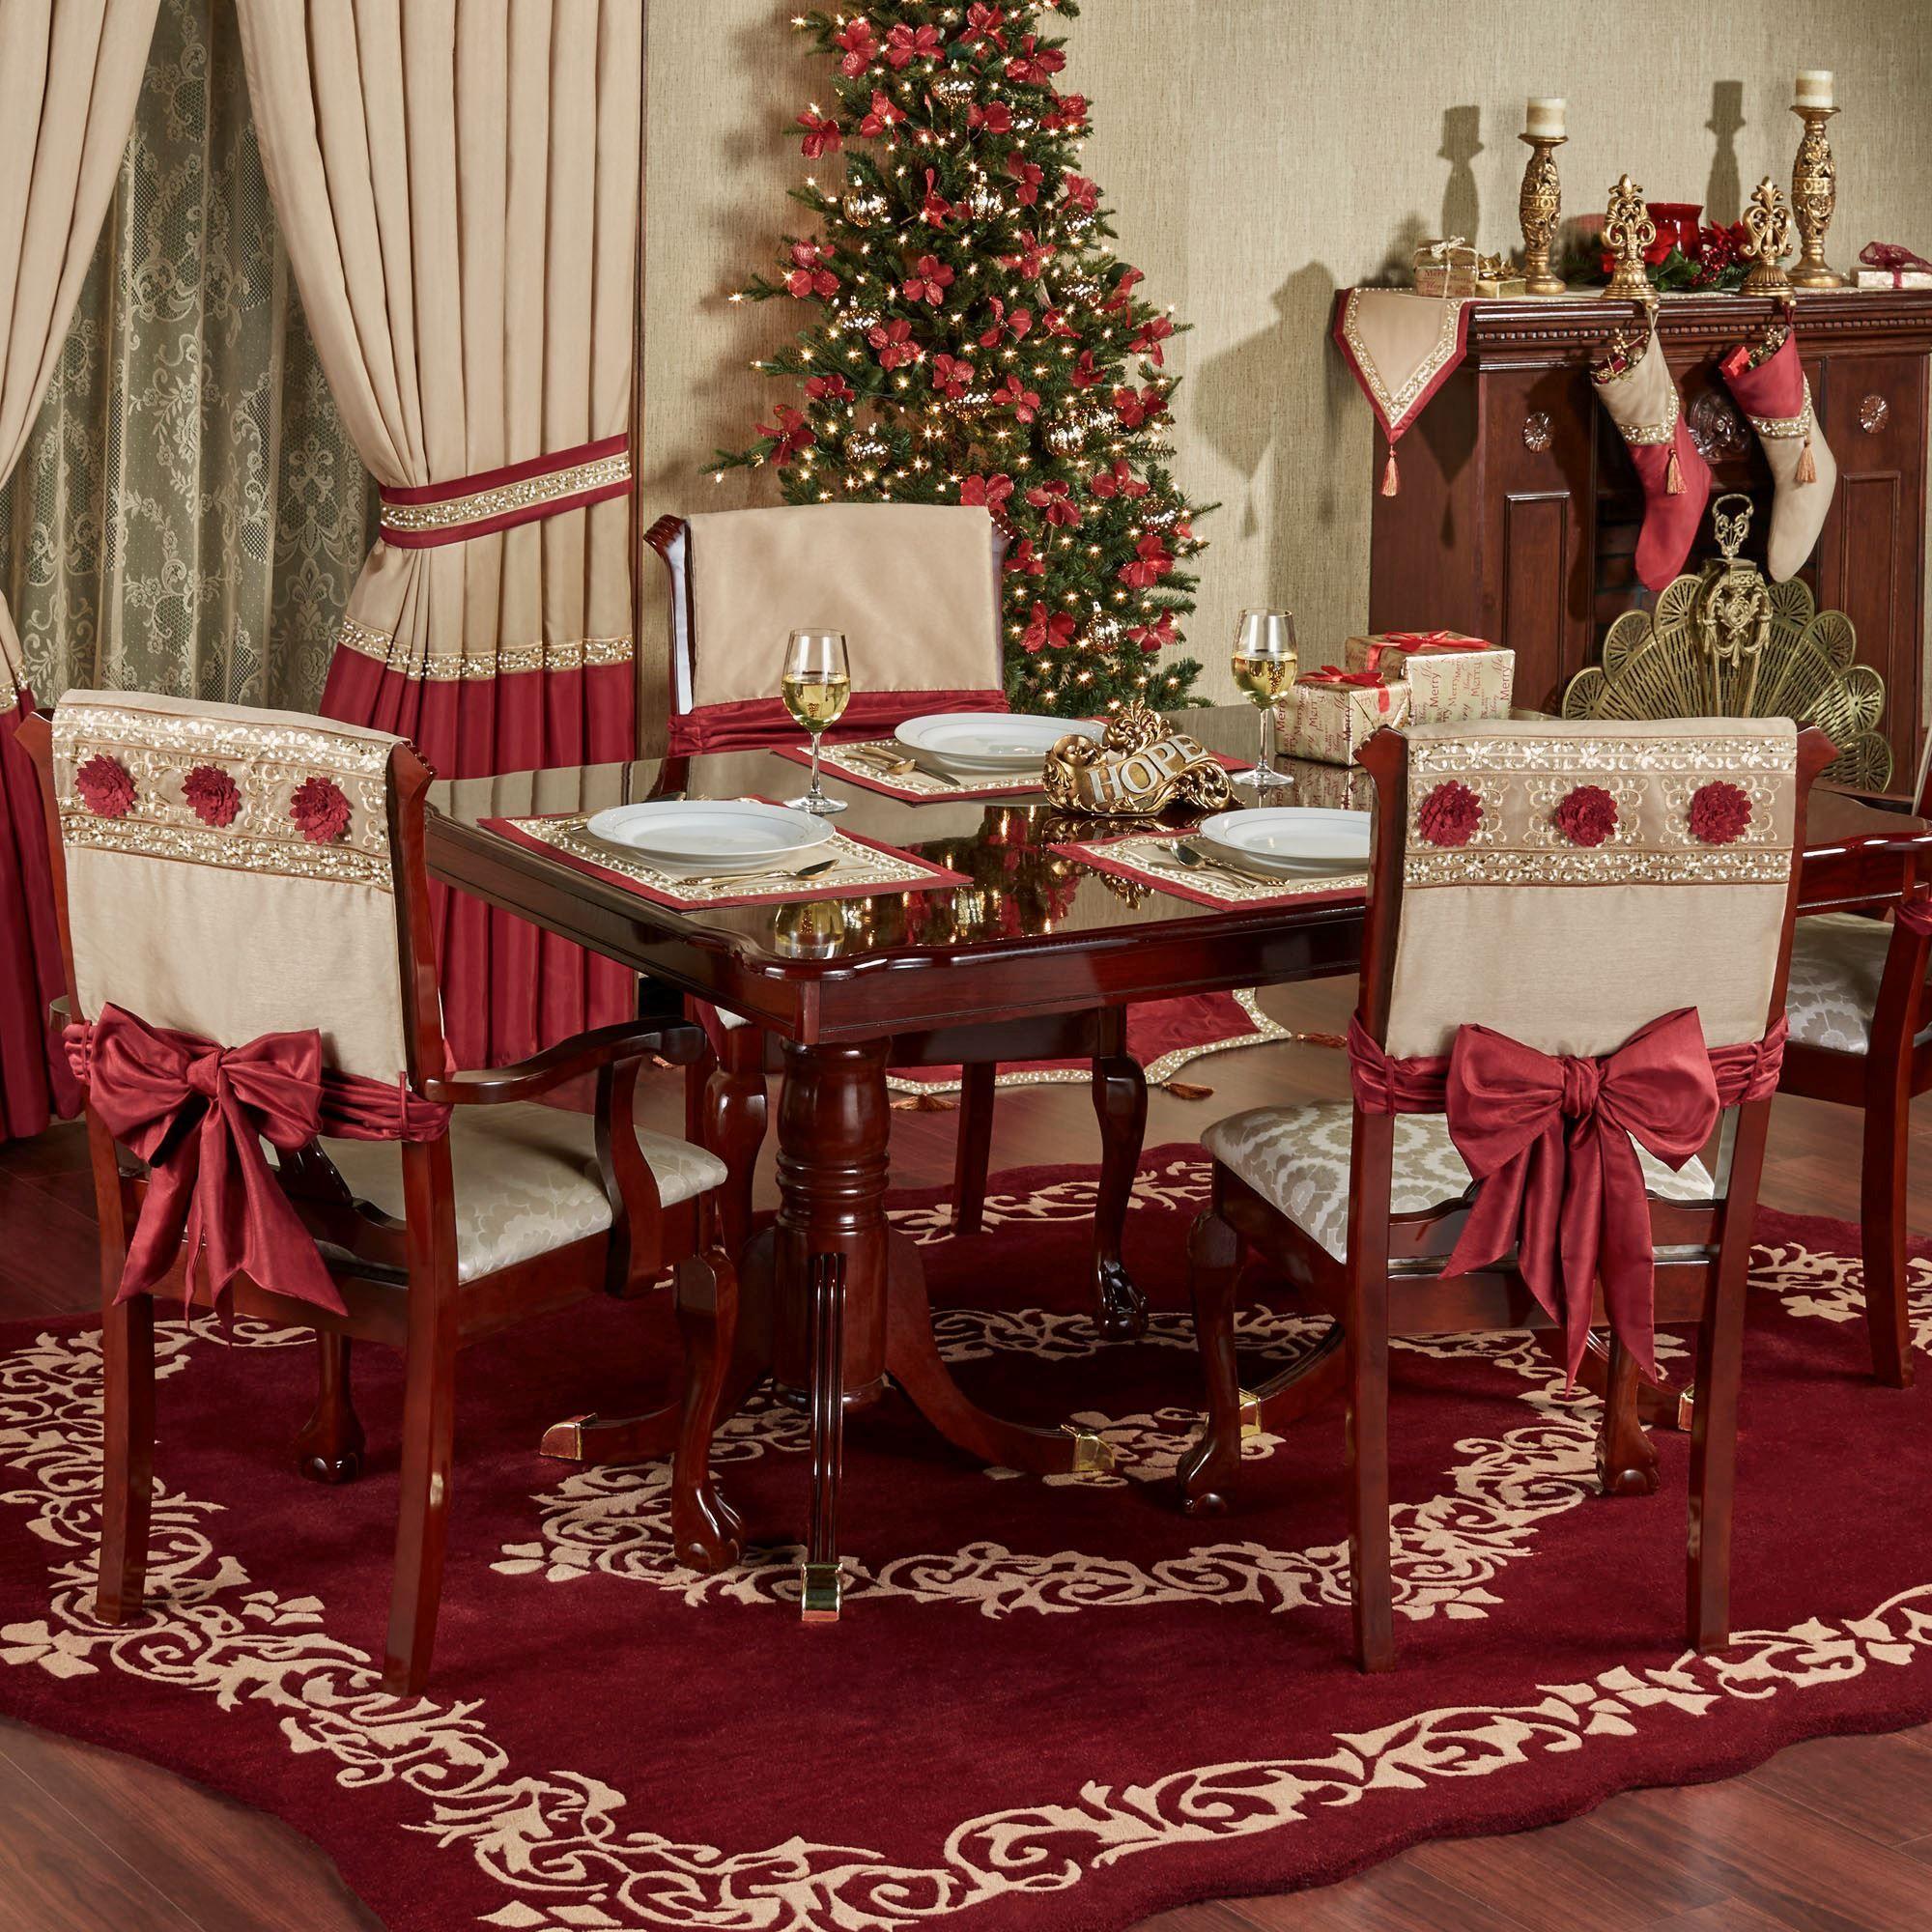 Prestige Chair Cover Set with Sash Ties  Christmas fireplace